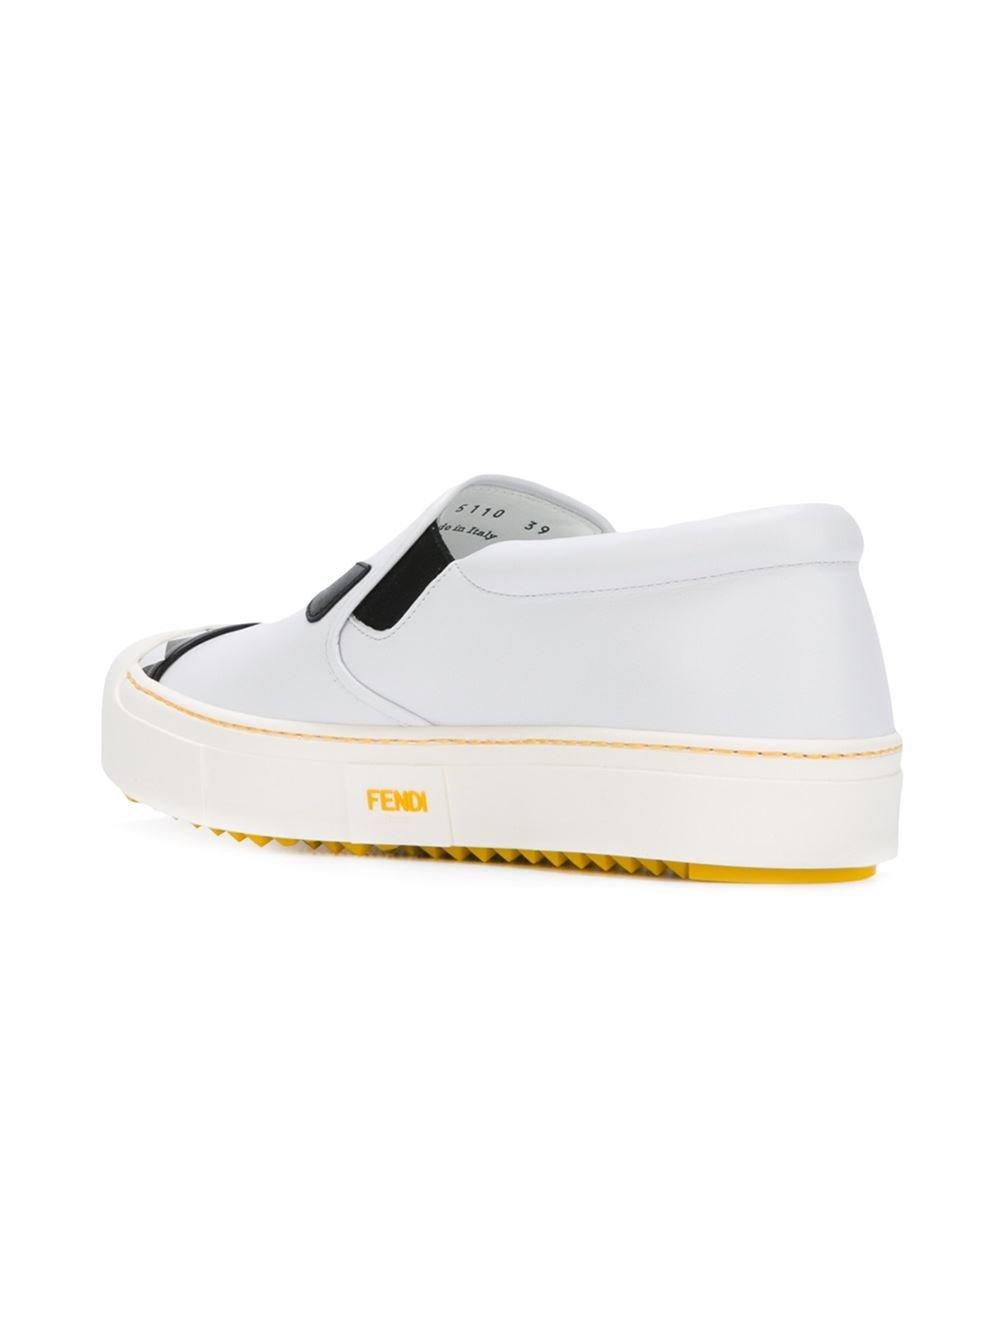 Bugs Sac Fendi Chaussures De Sport - Blanc syAT0